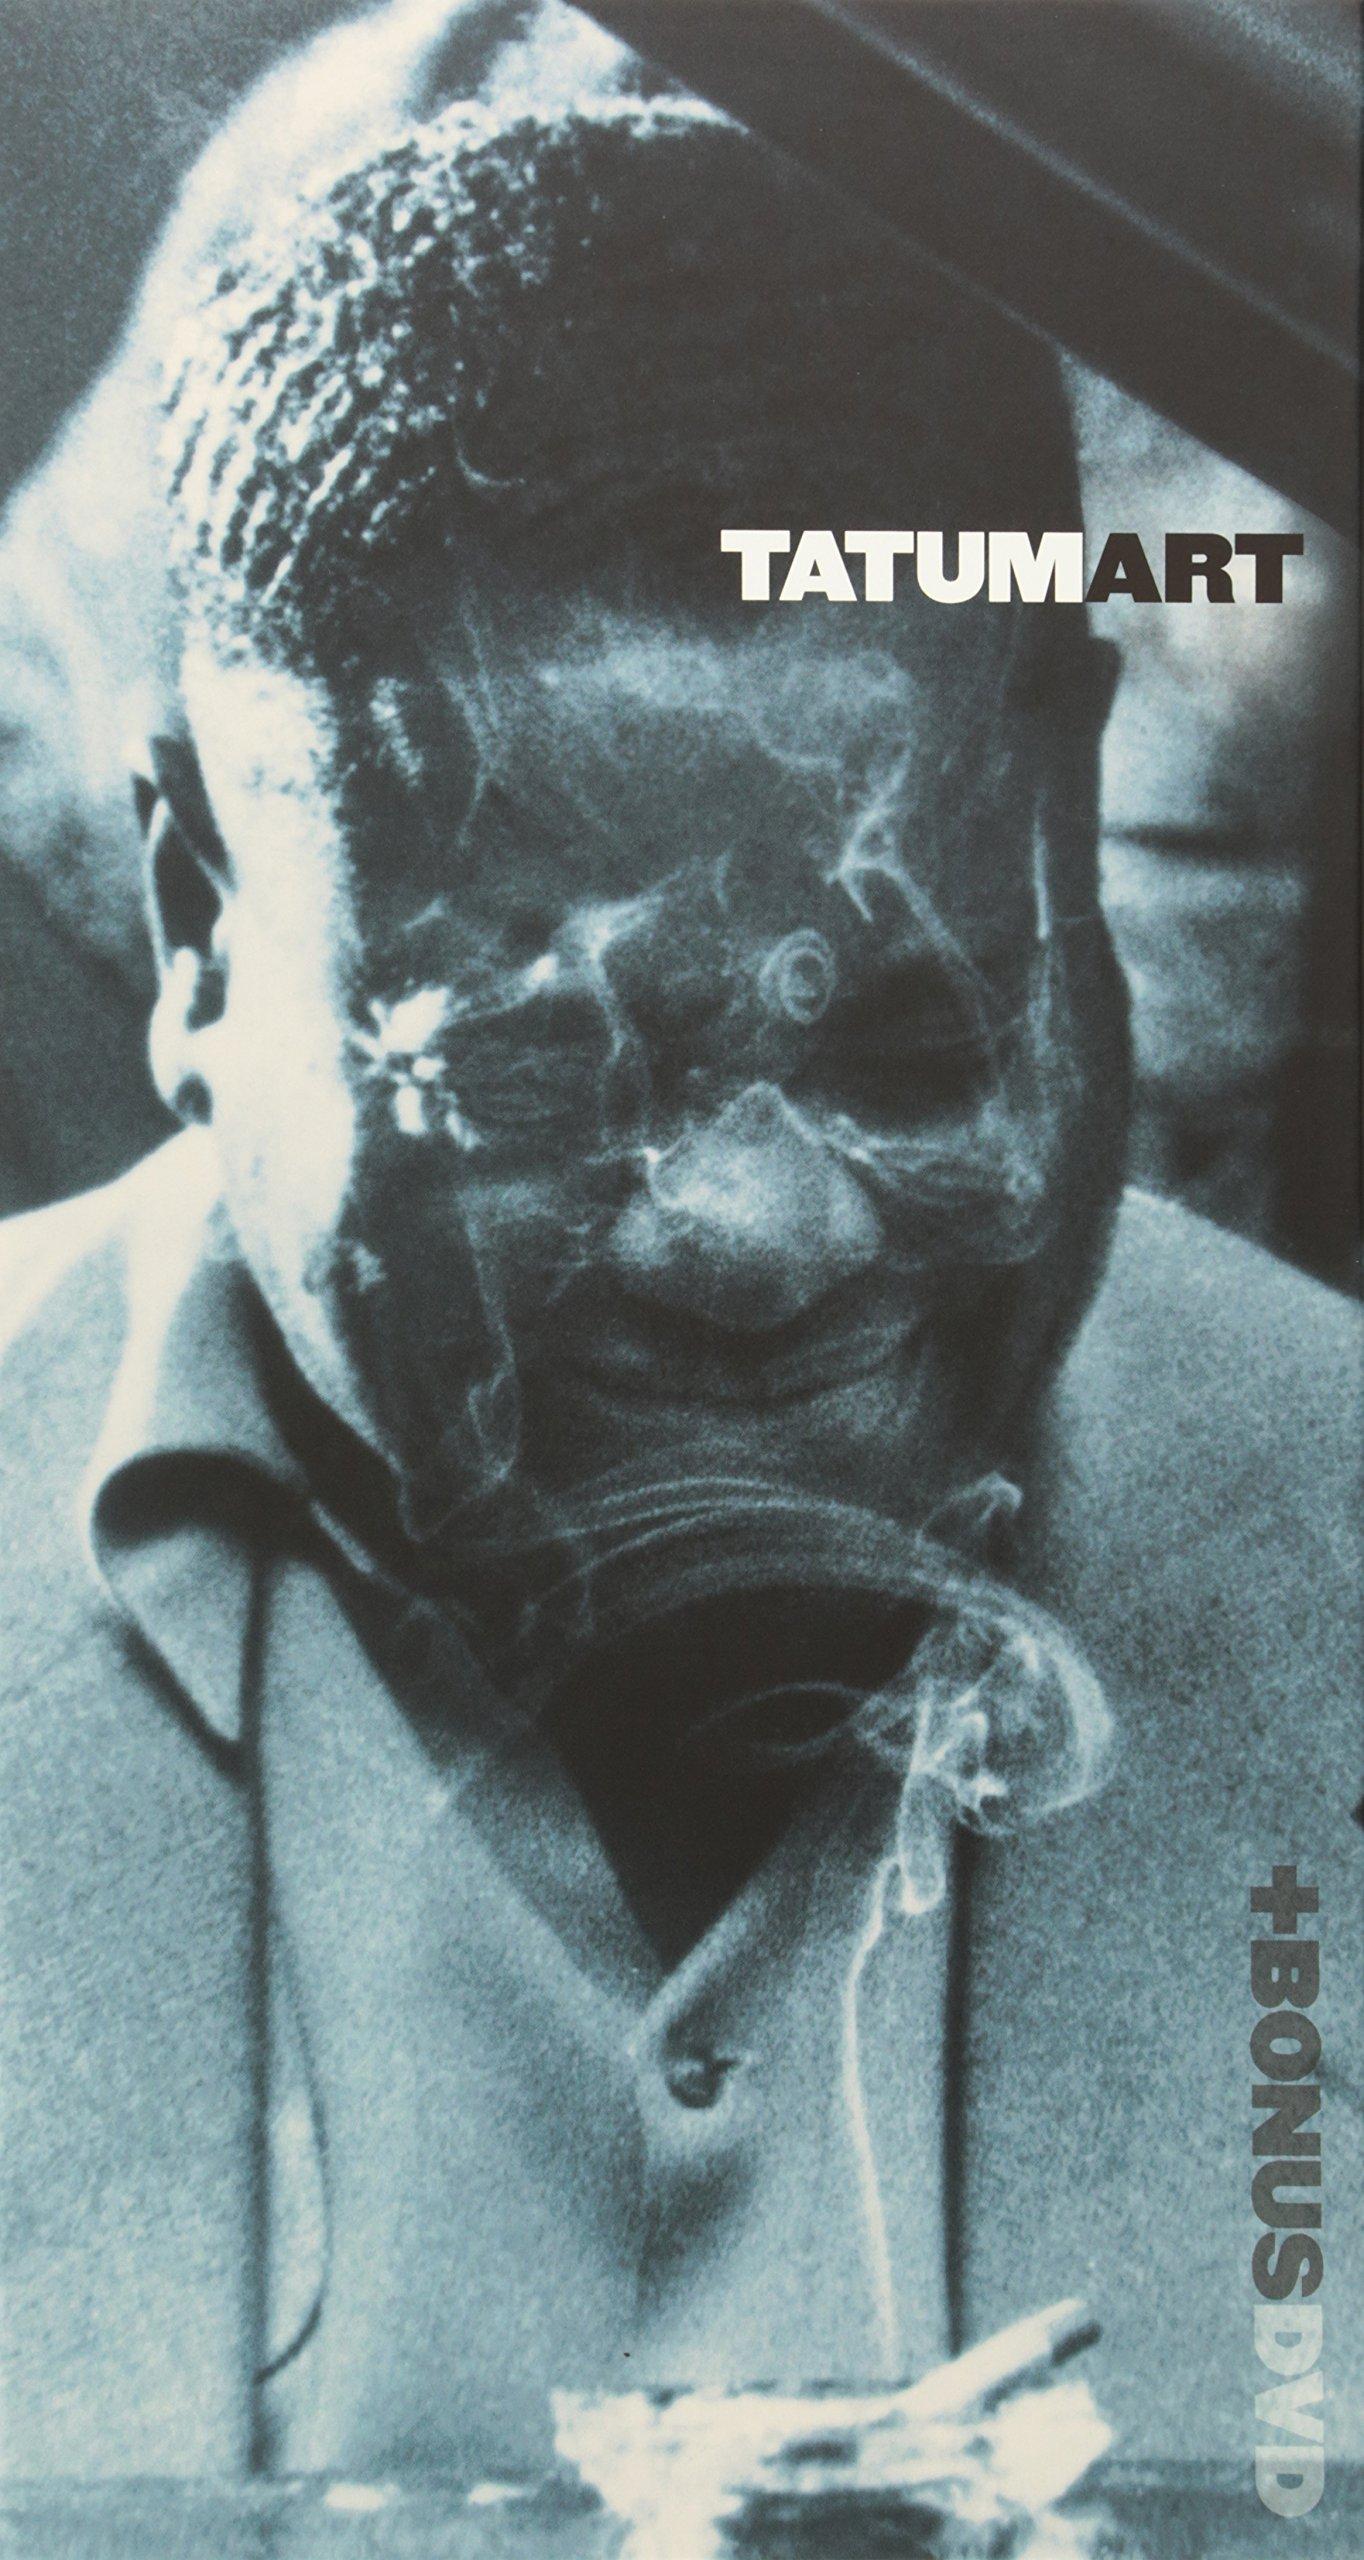 Tatum Art [10 Disc] [Box Set] [Bonus DVD] by Storyville